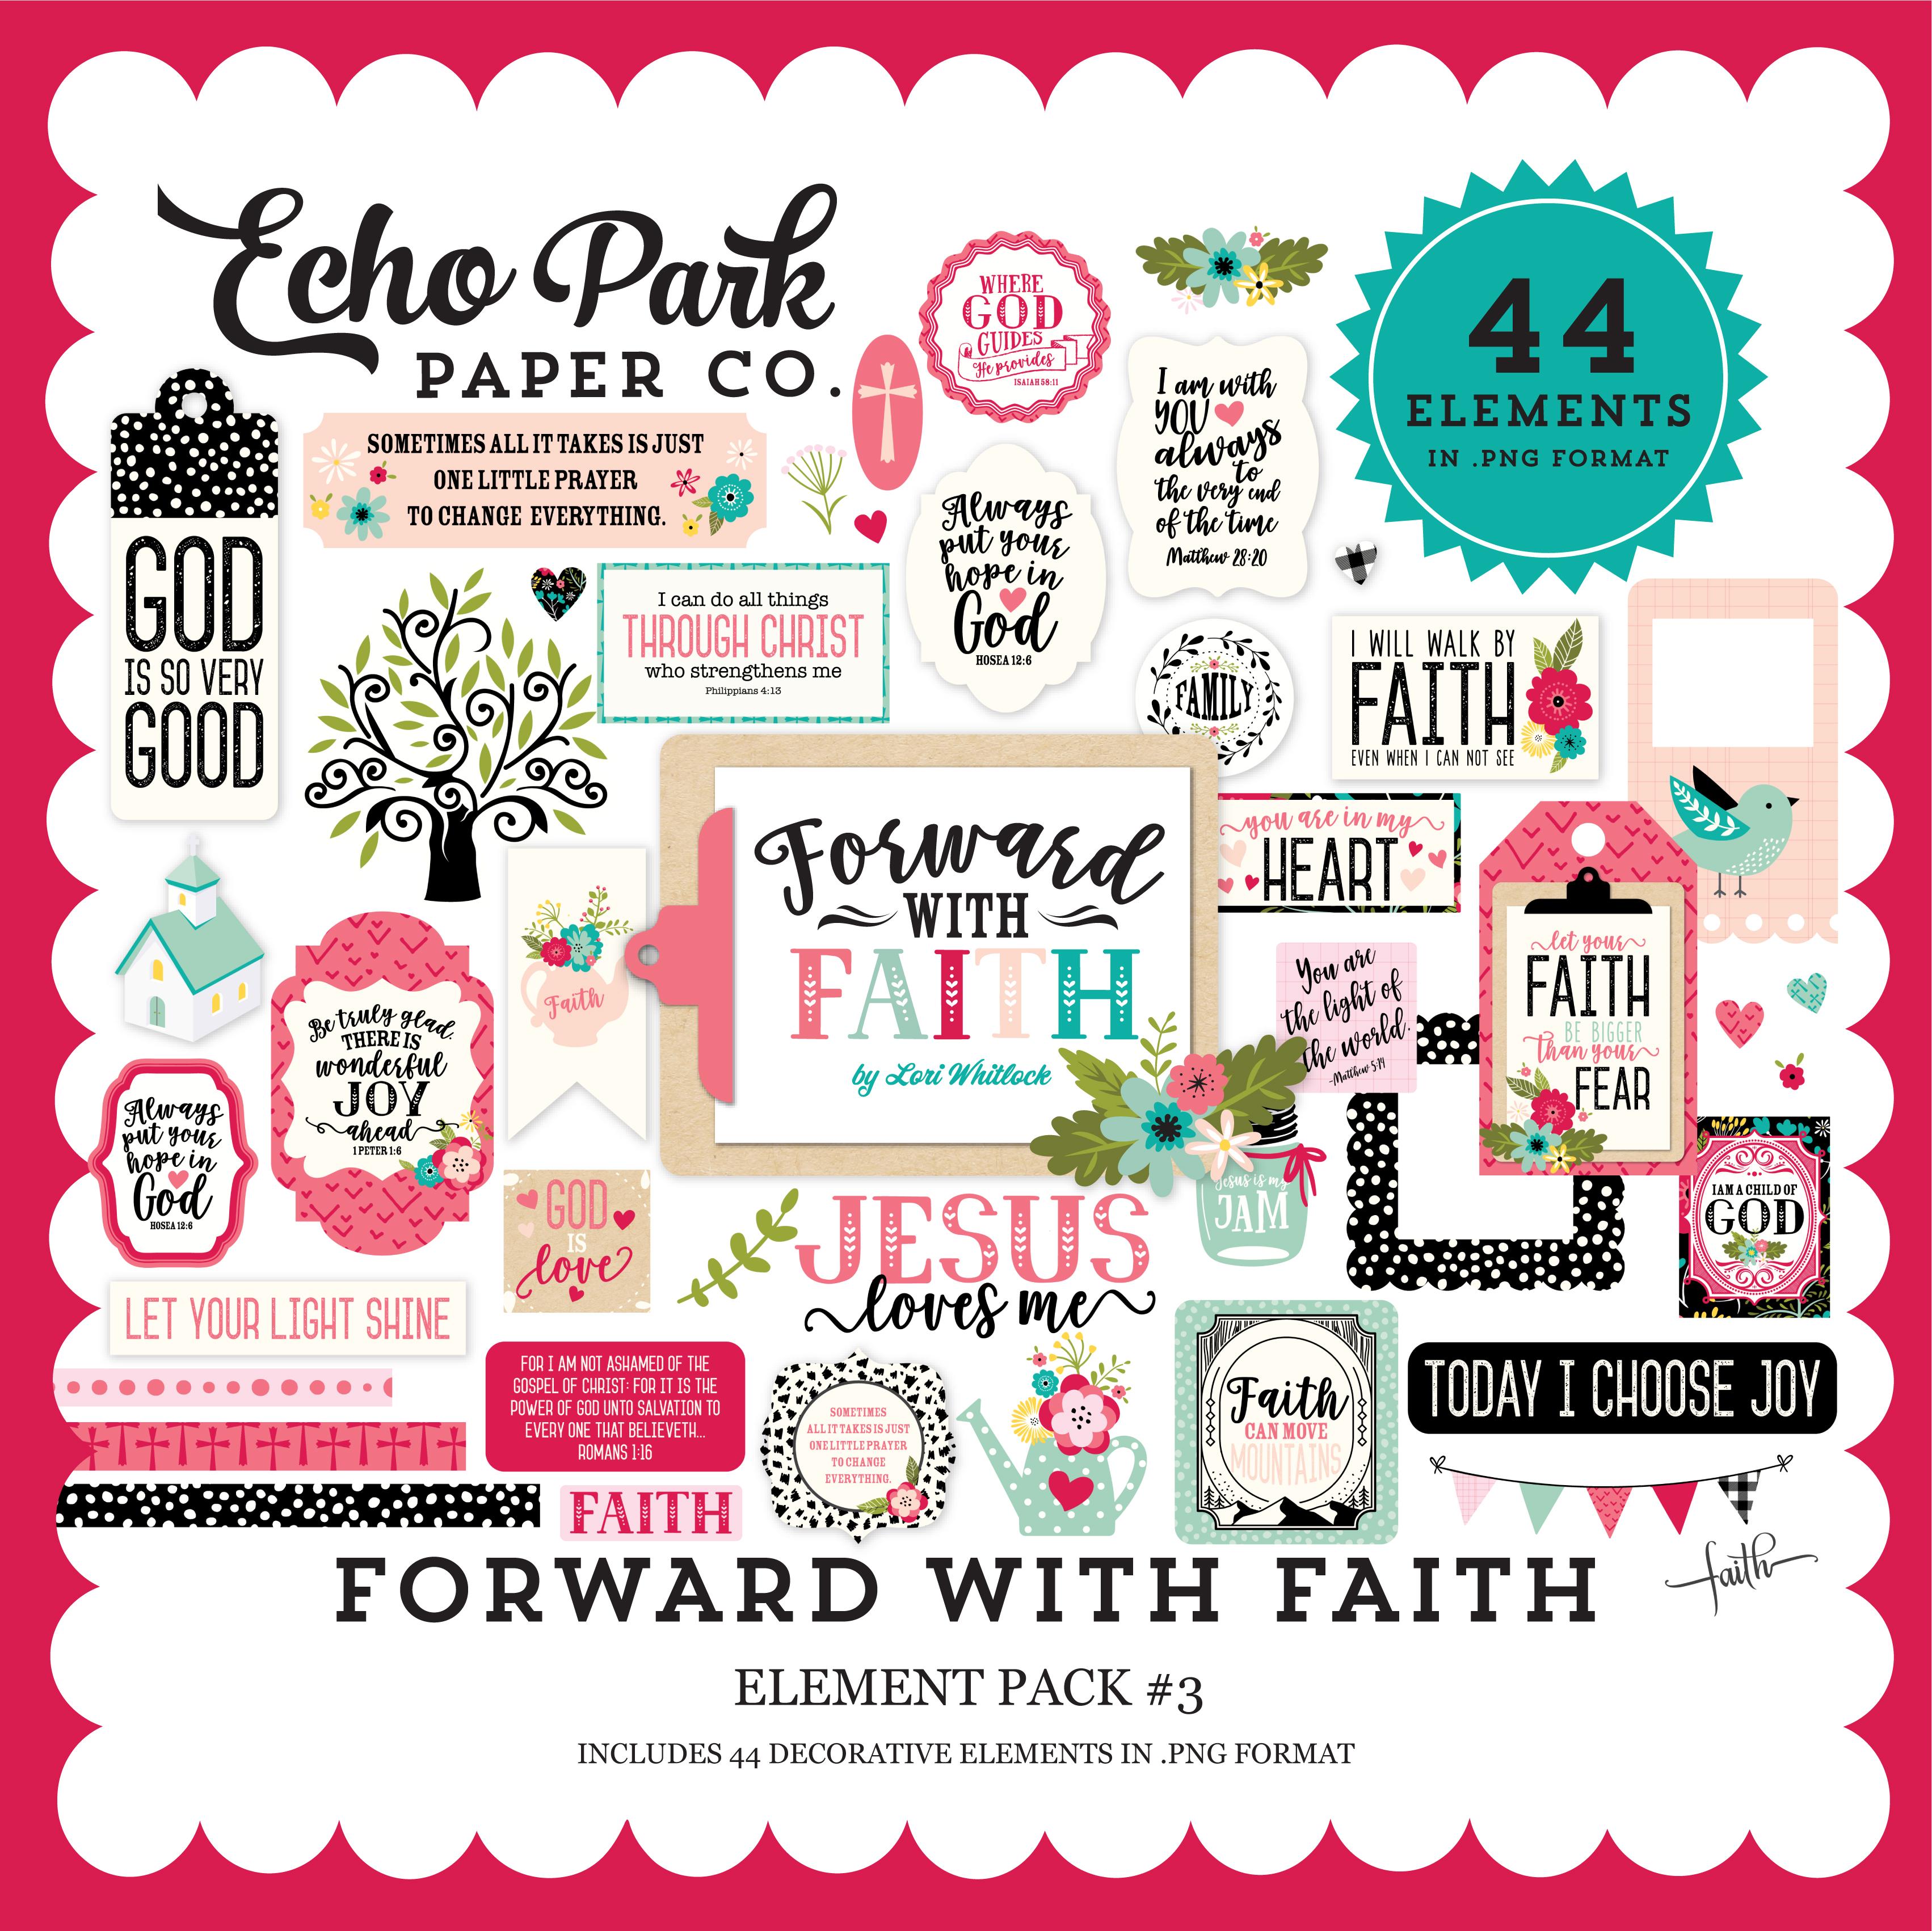 Forward with Faith Element Pack #3